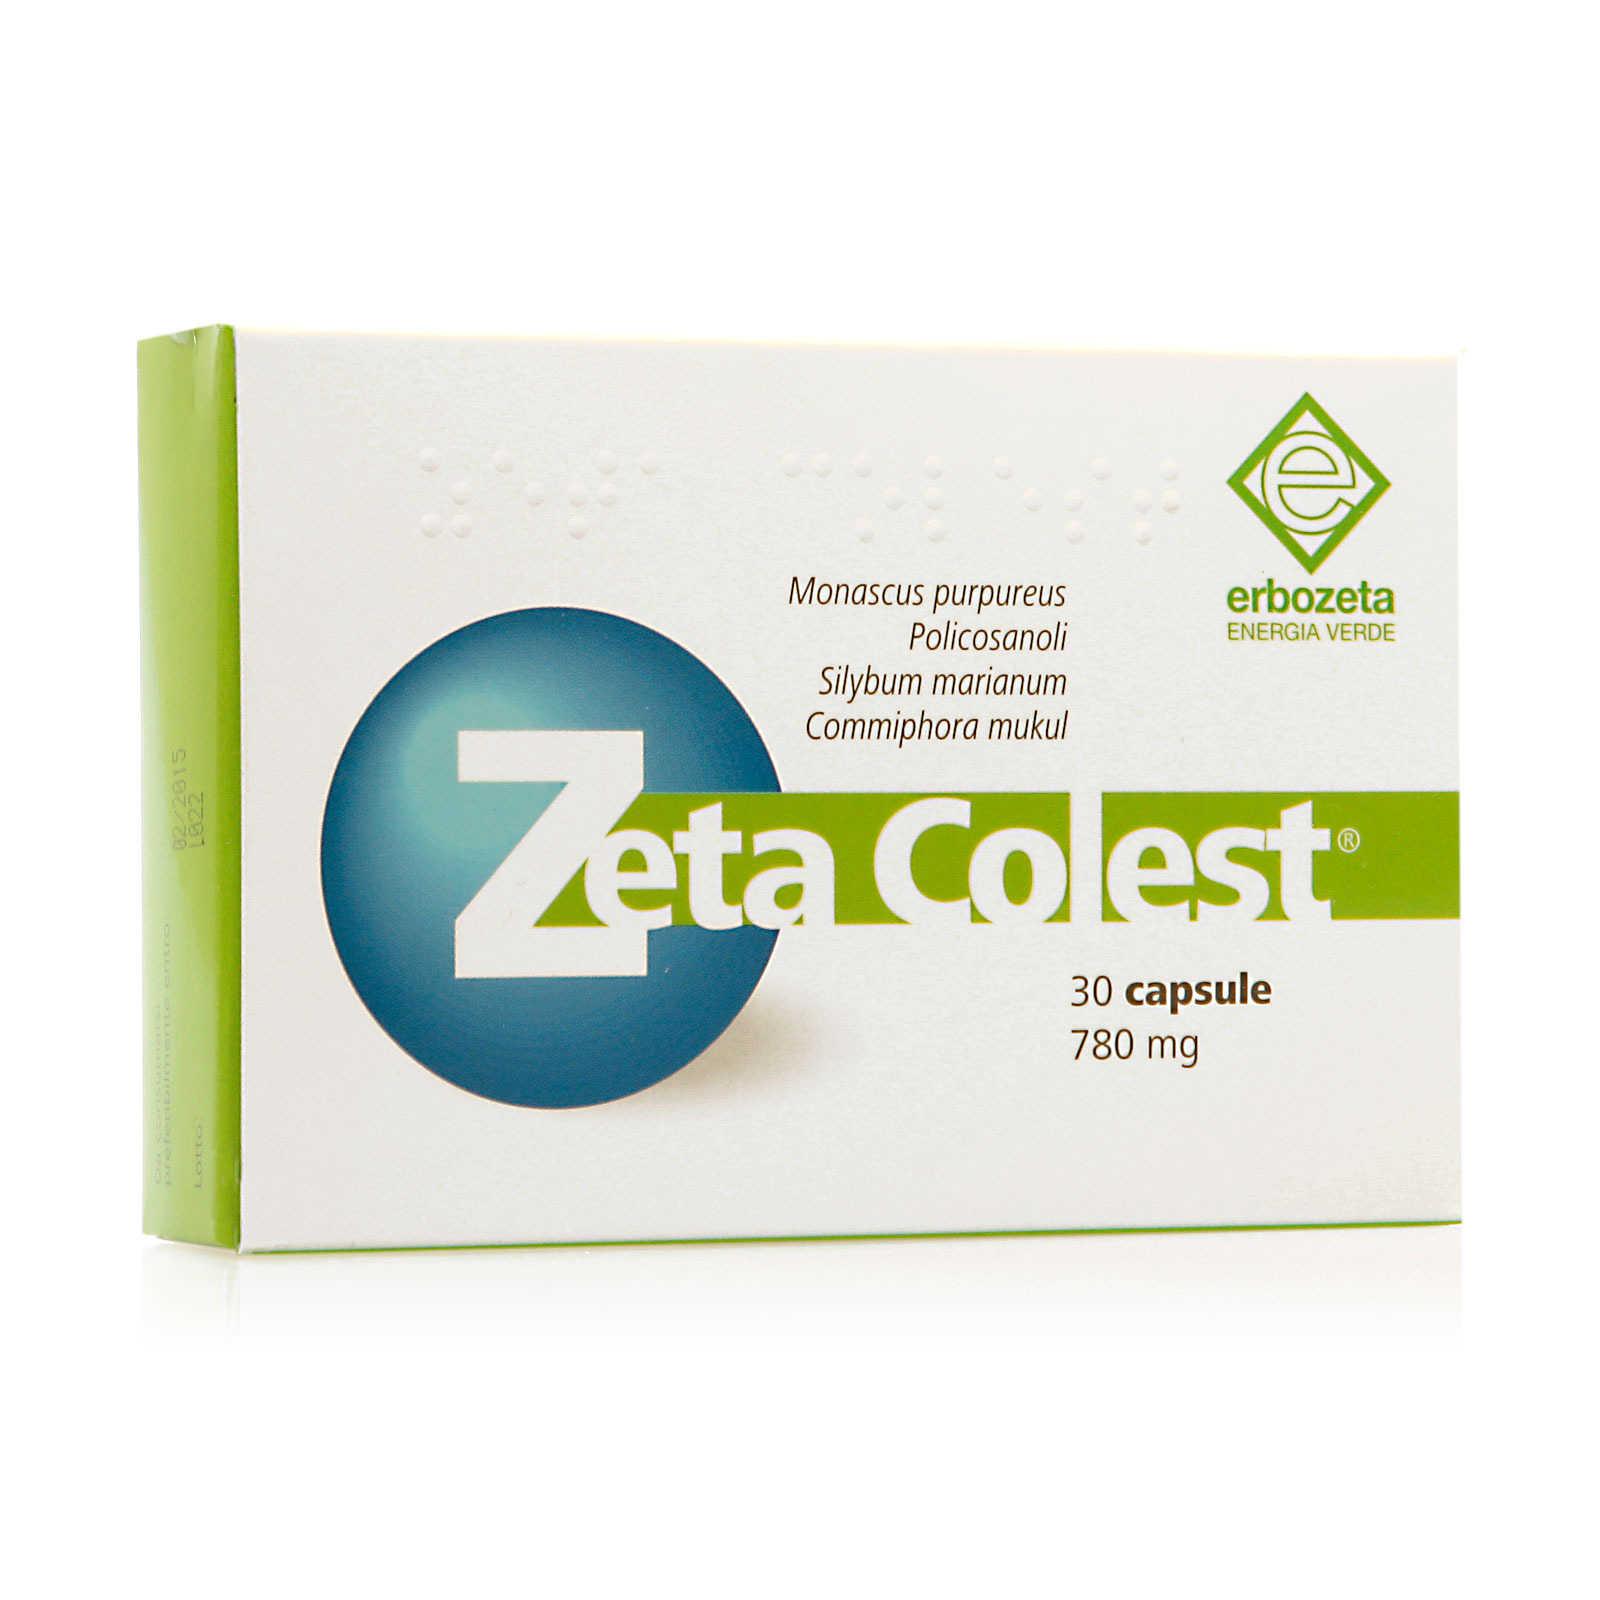 Erbozeta - Integratore Alimentare - Zeta Colest